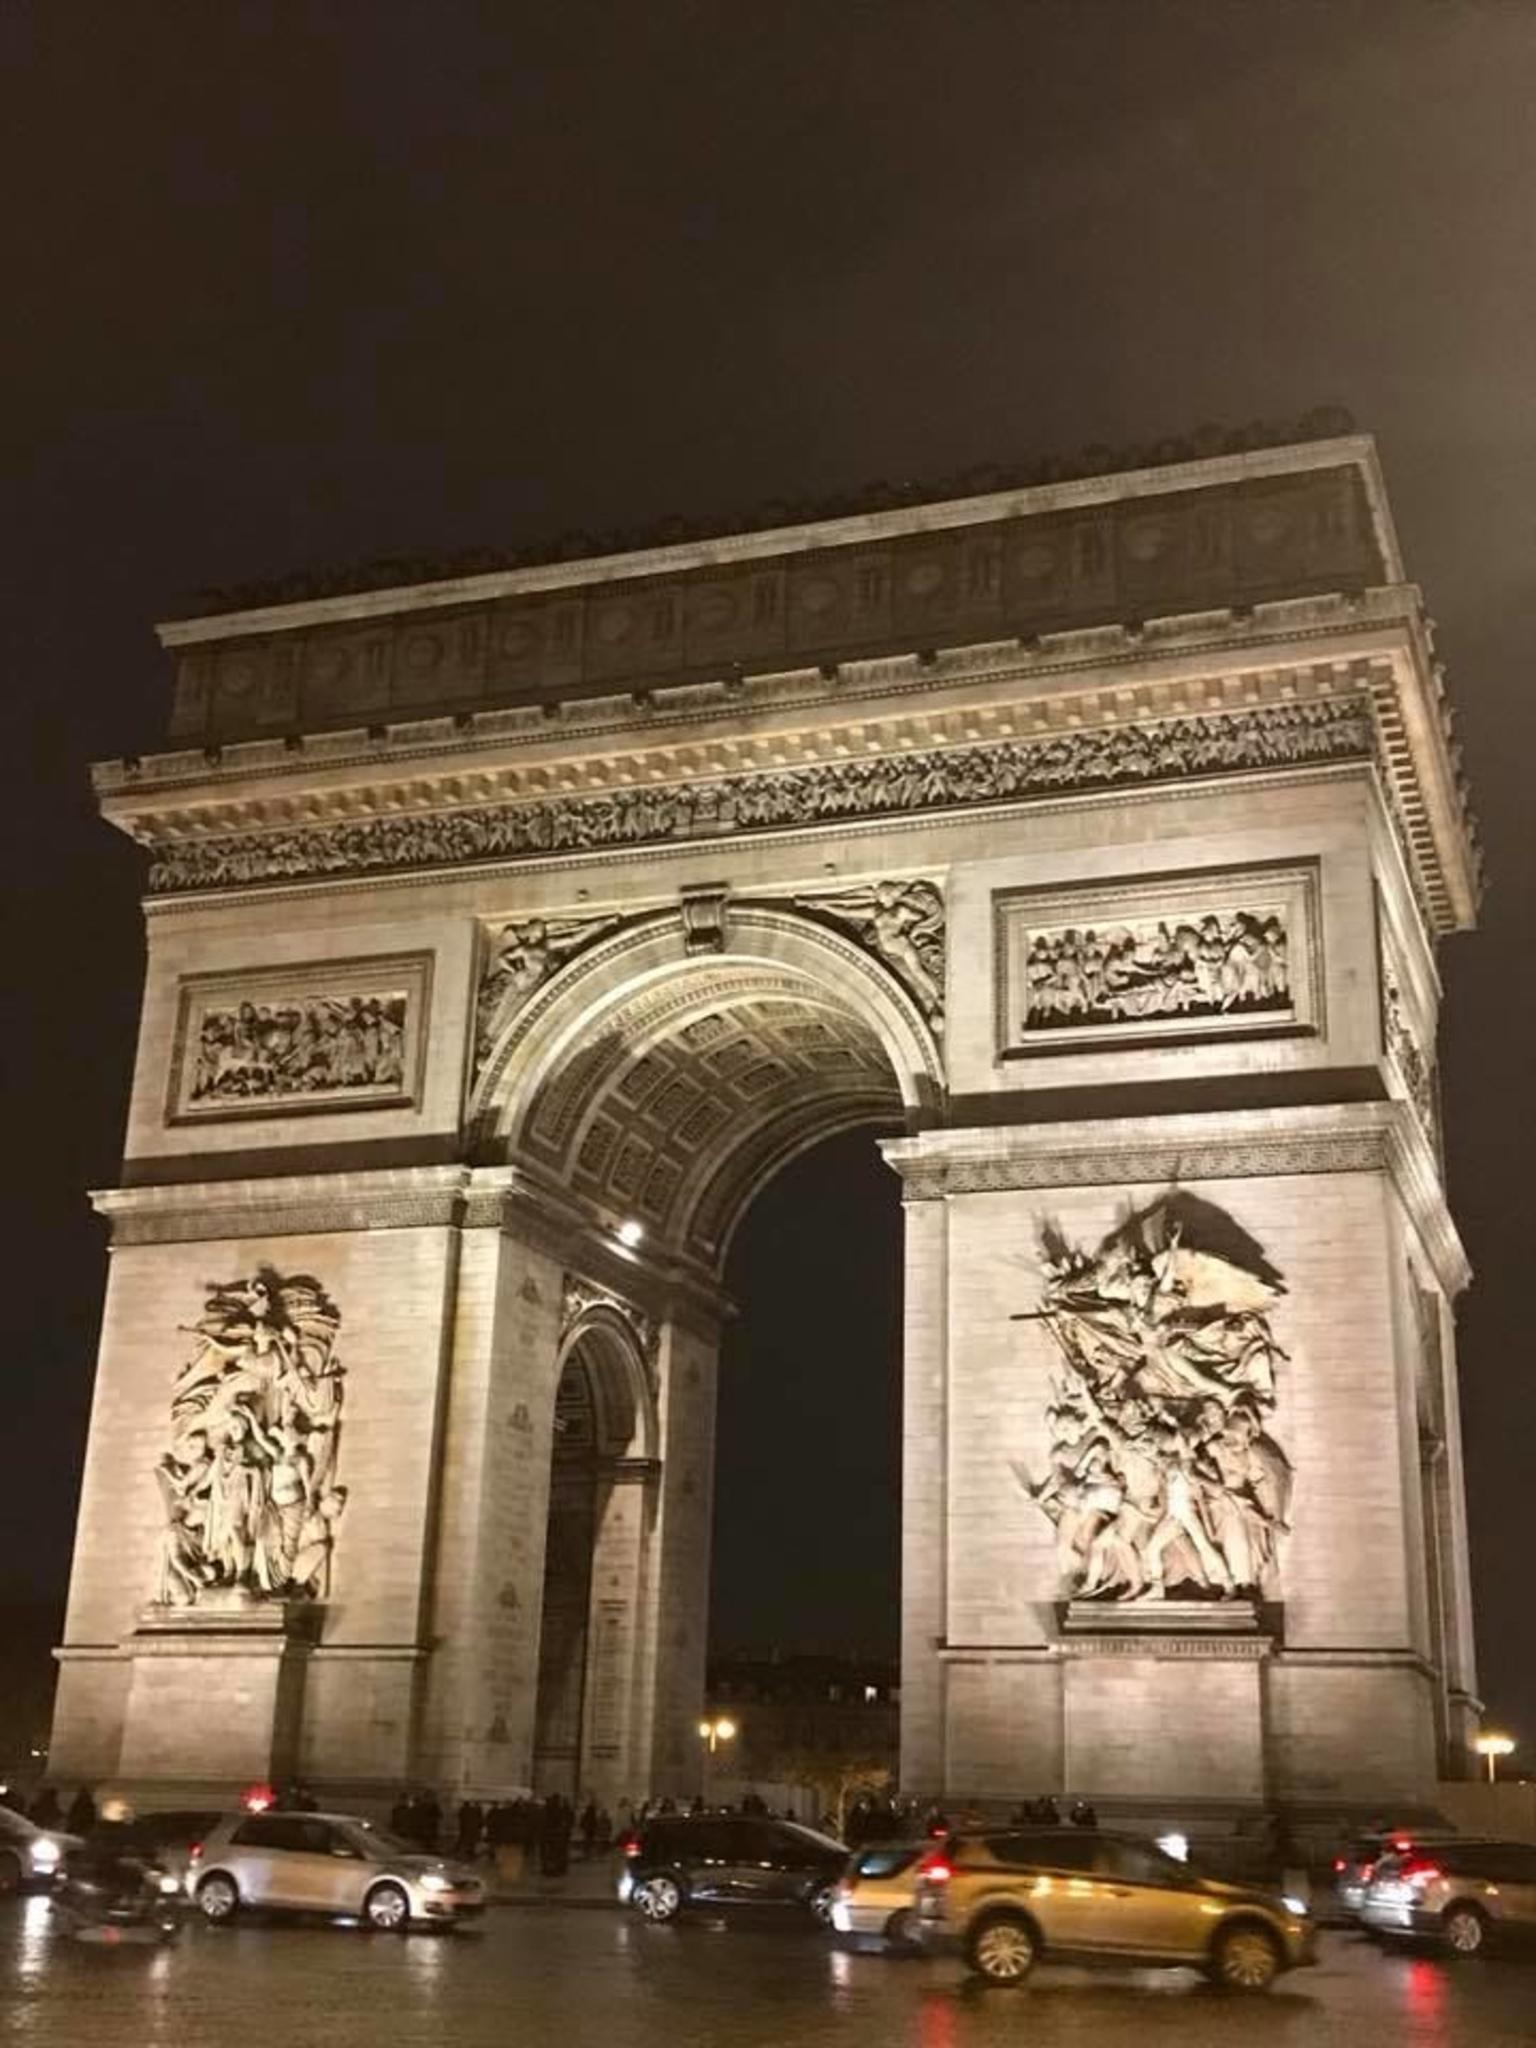 MORE PHOTOS, Skip the Line: Arc de Triomphe Including Terrace Access Ticket